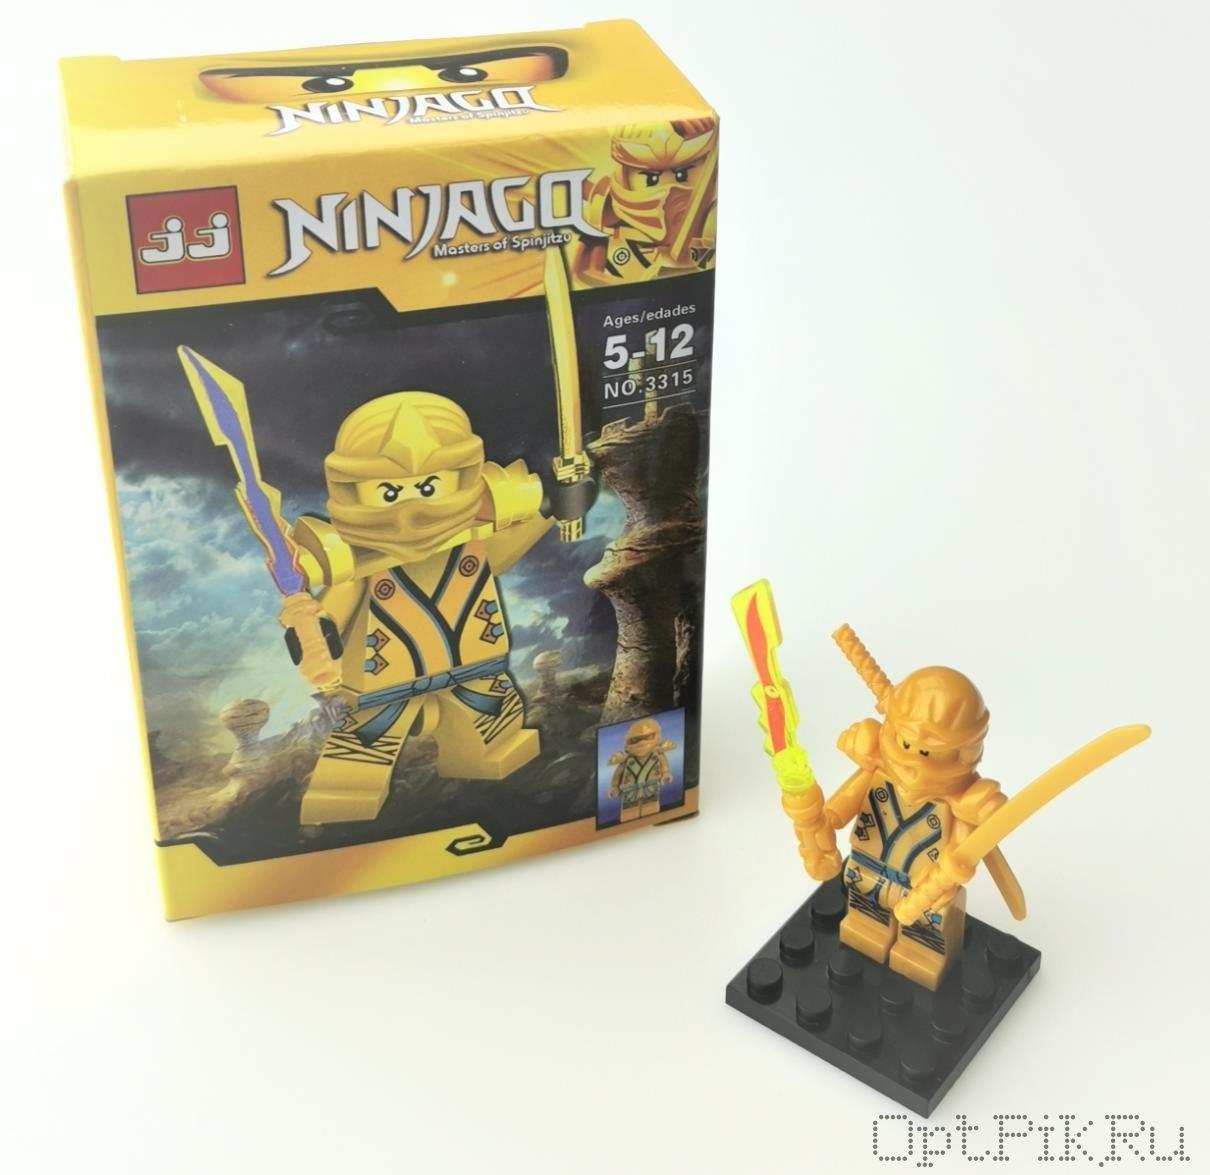 LEGO Ninjago (Ниндзя го)